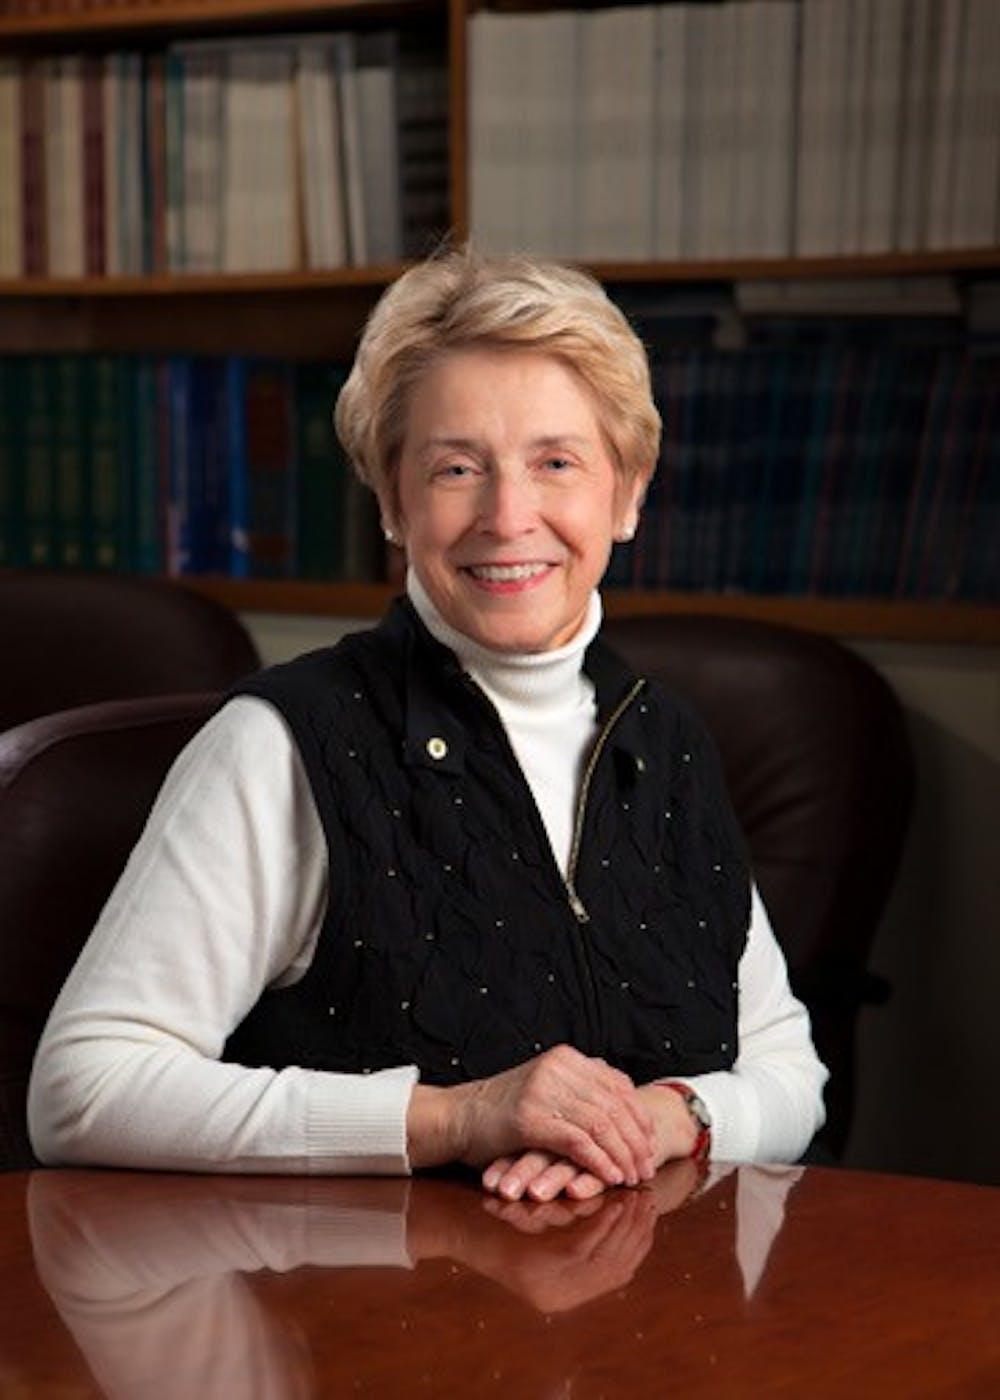 The new dean for the Mercer School of Medicine is Dr. Jean Sumner.